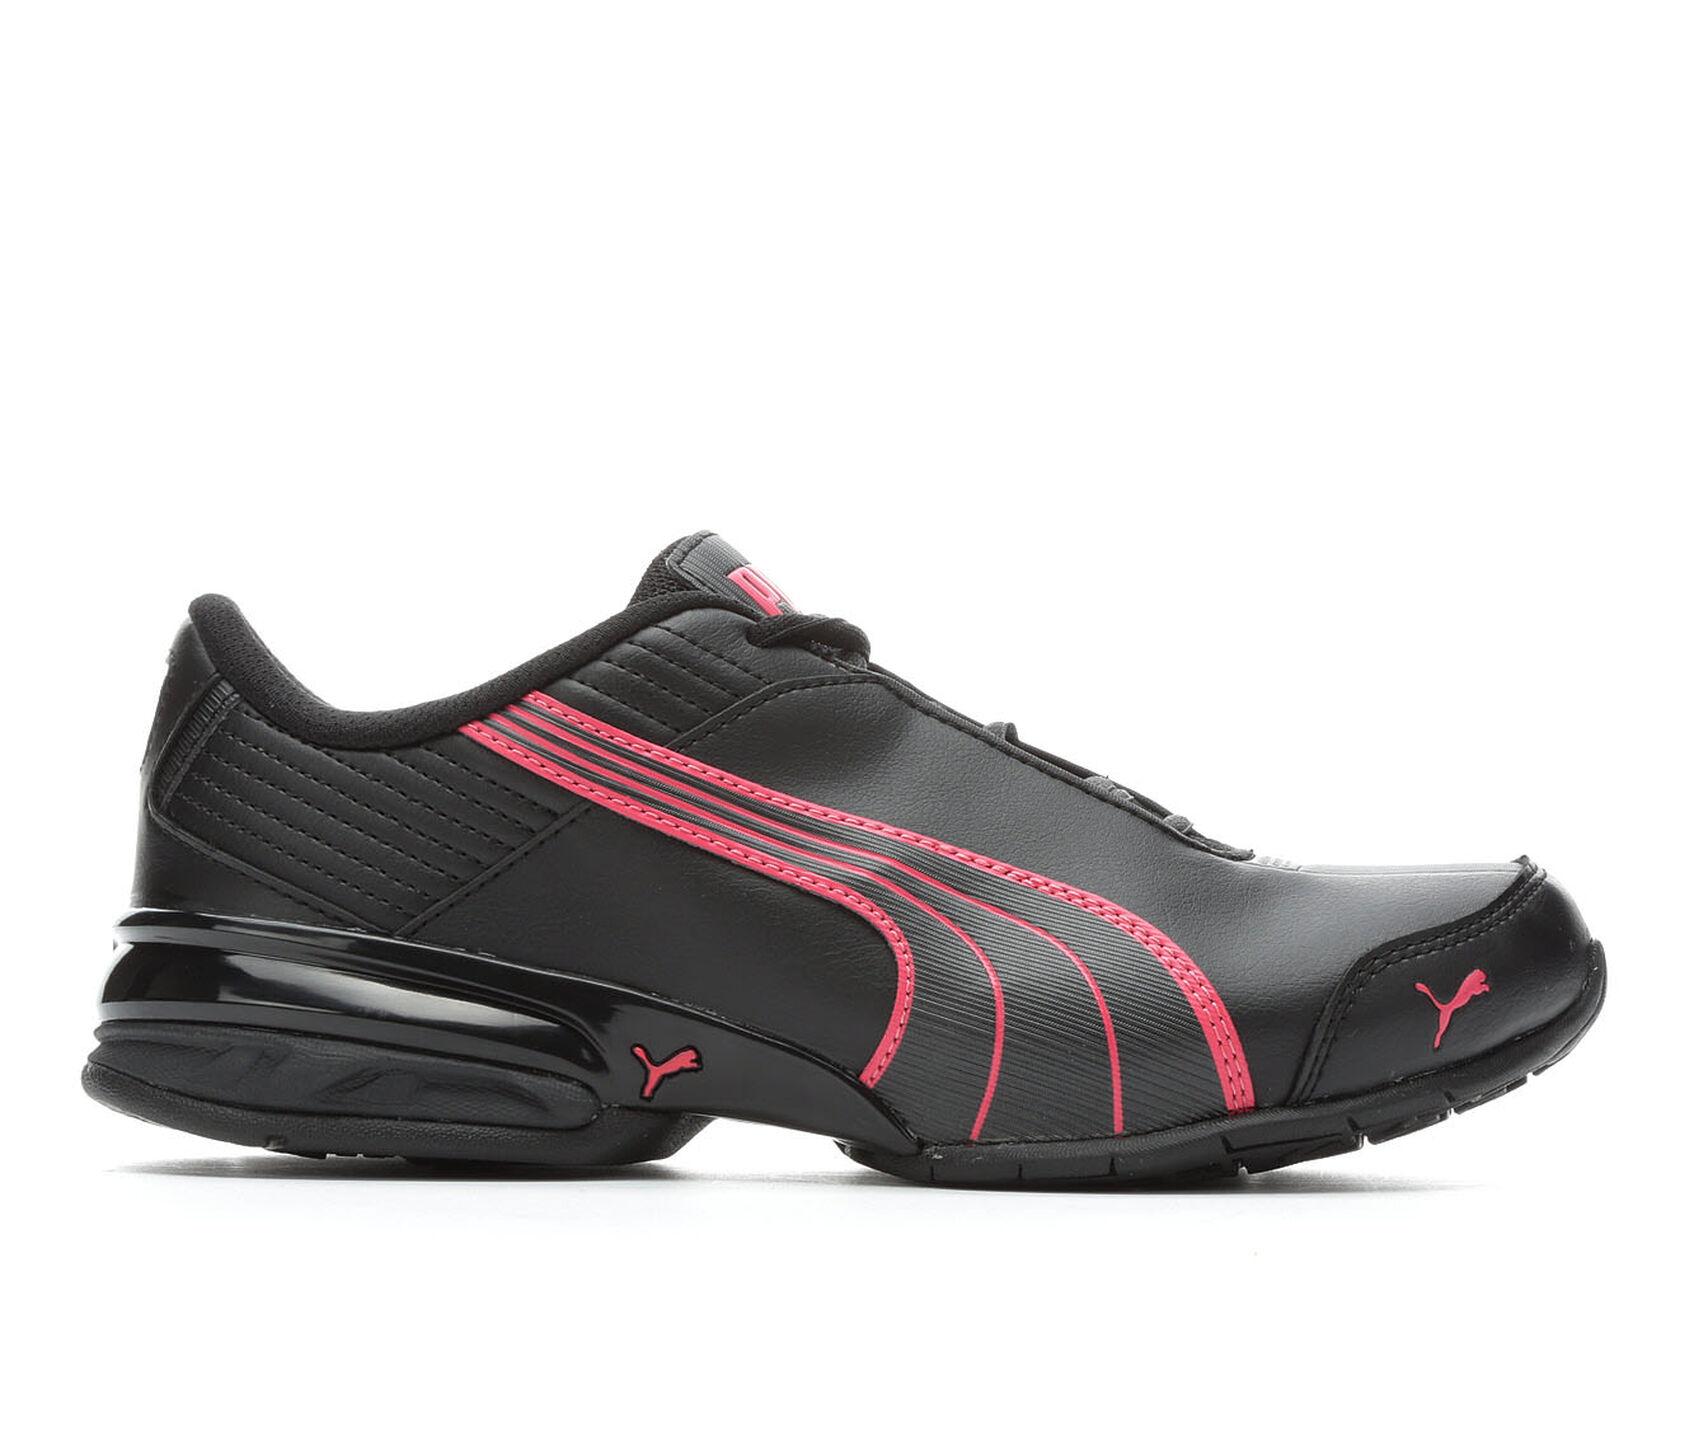 Puma Eco Ortholite Womens Shoes